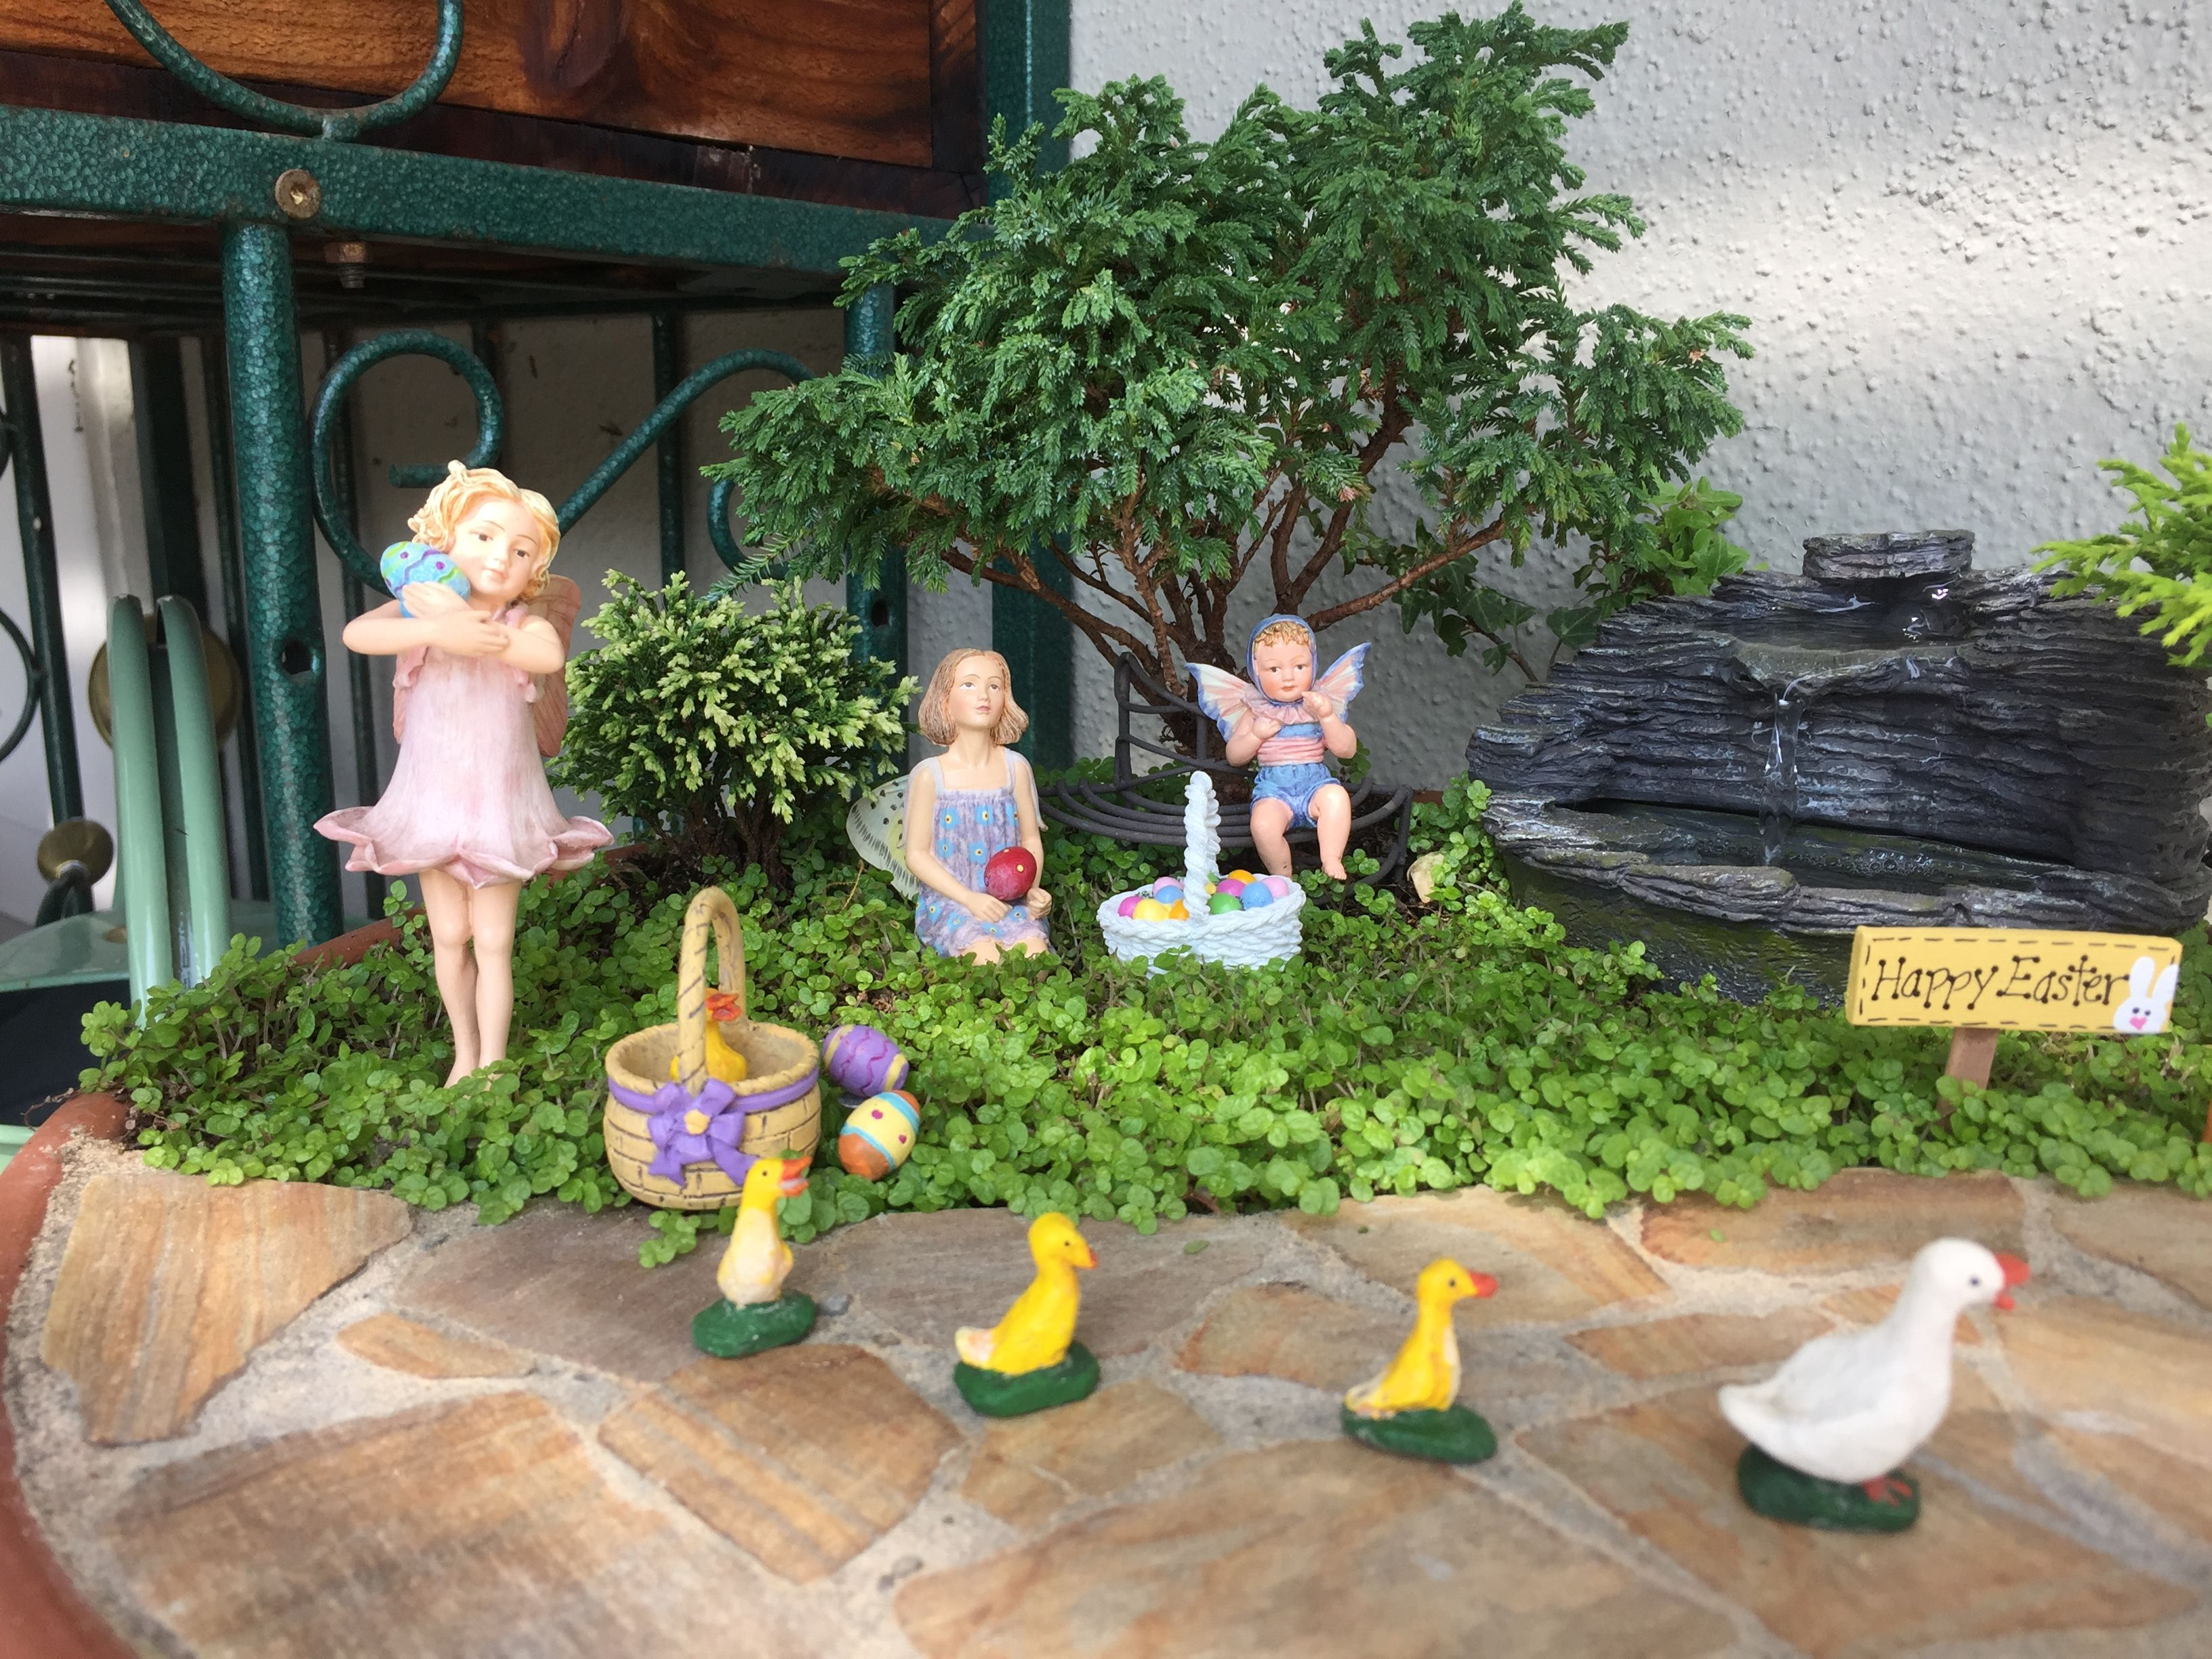 Miniature Fairy Garden   FOUNTAIN OF FAIRIES Has A Shale Water Fountain;  Ivy Sets The